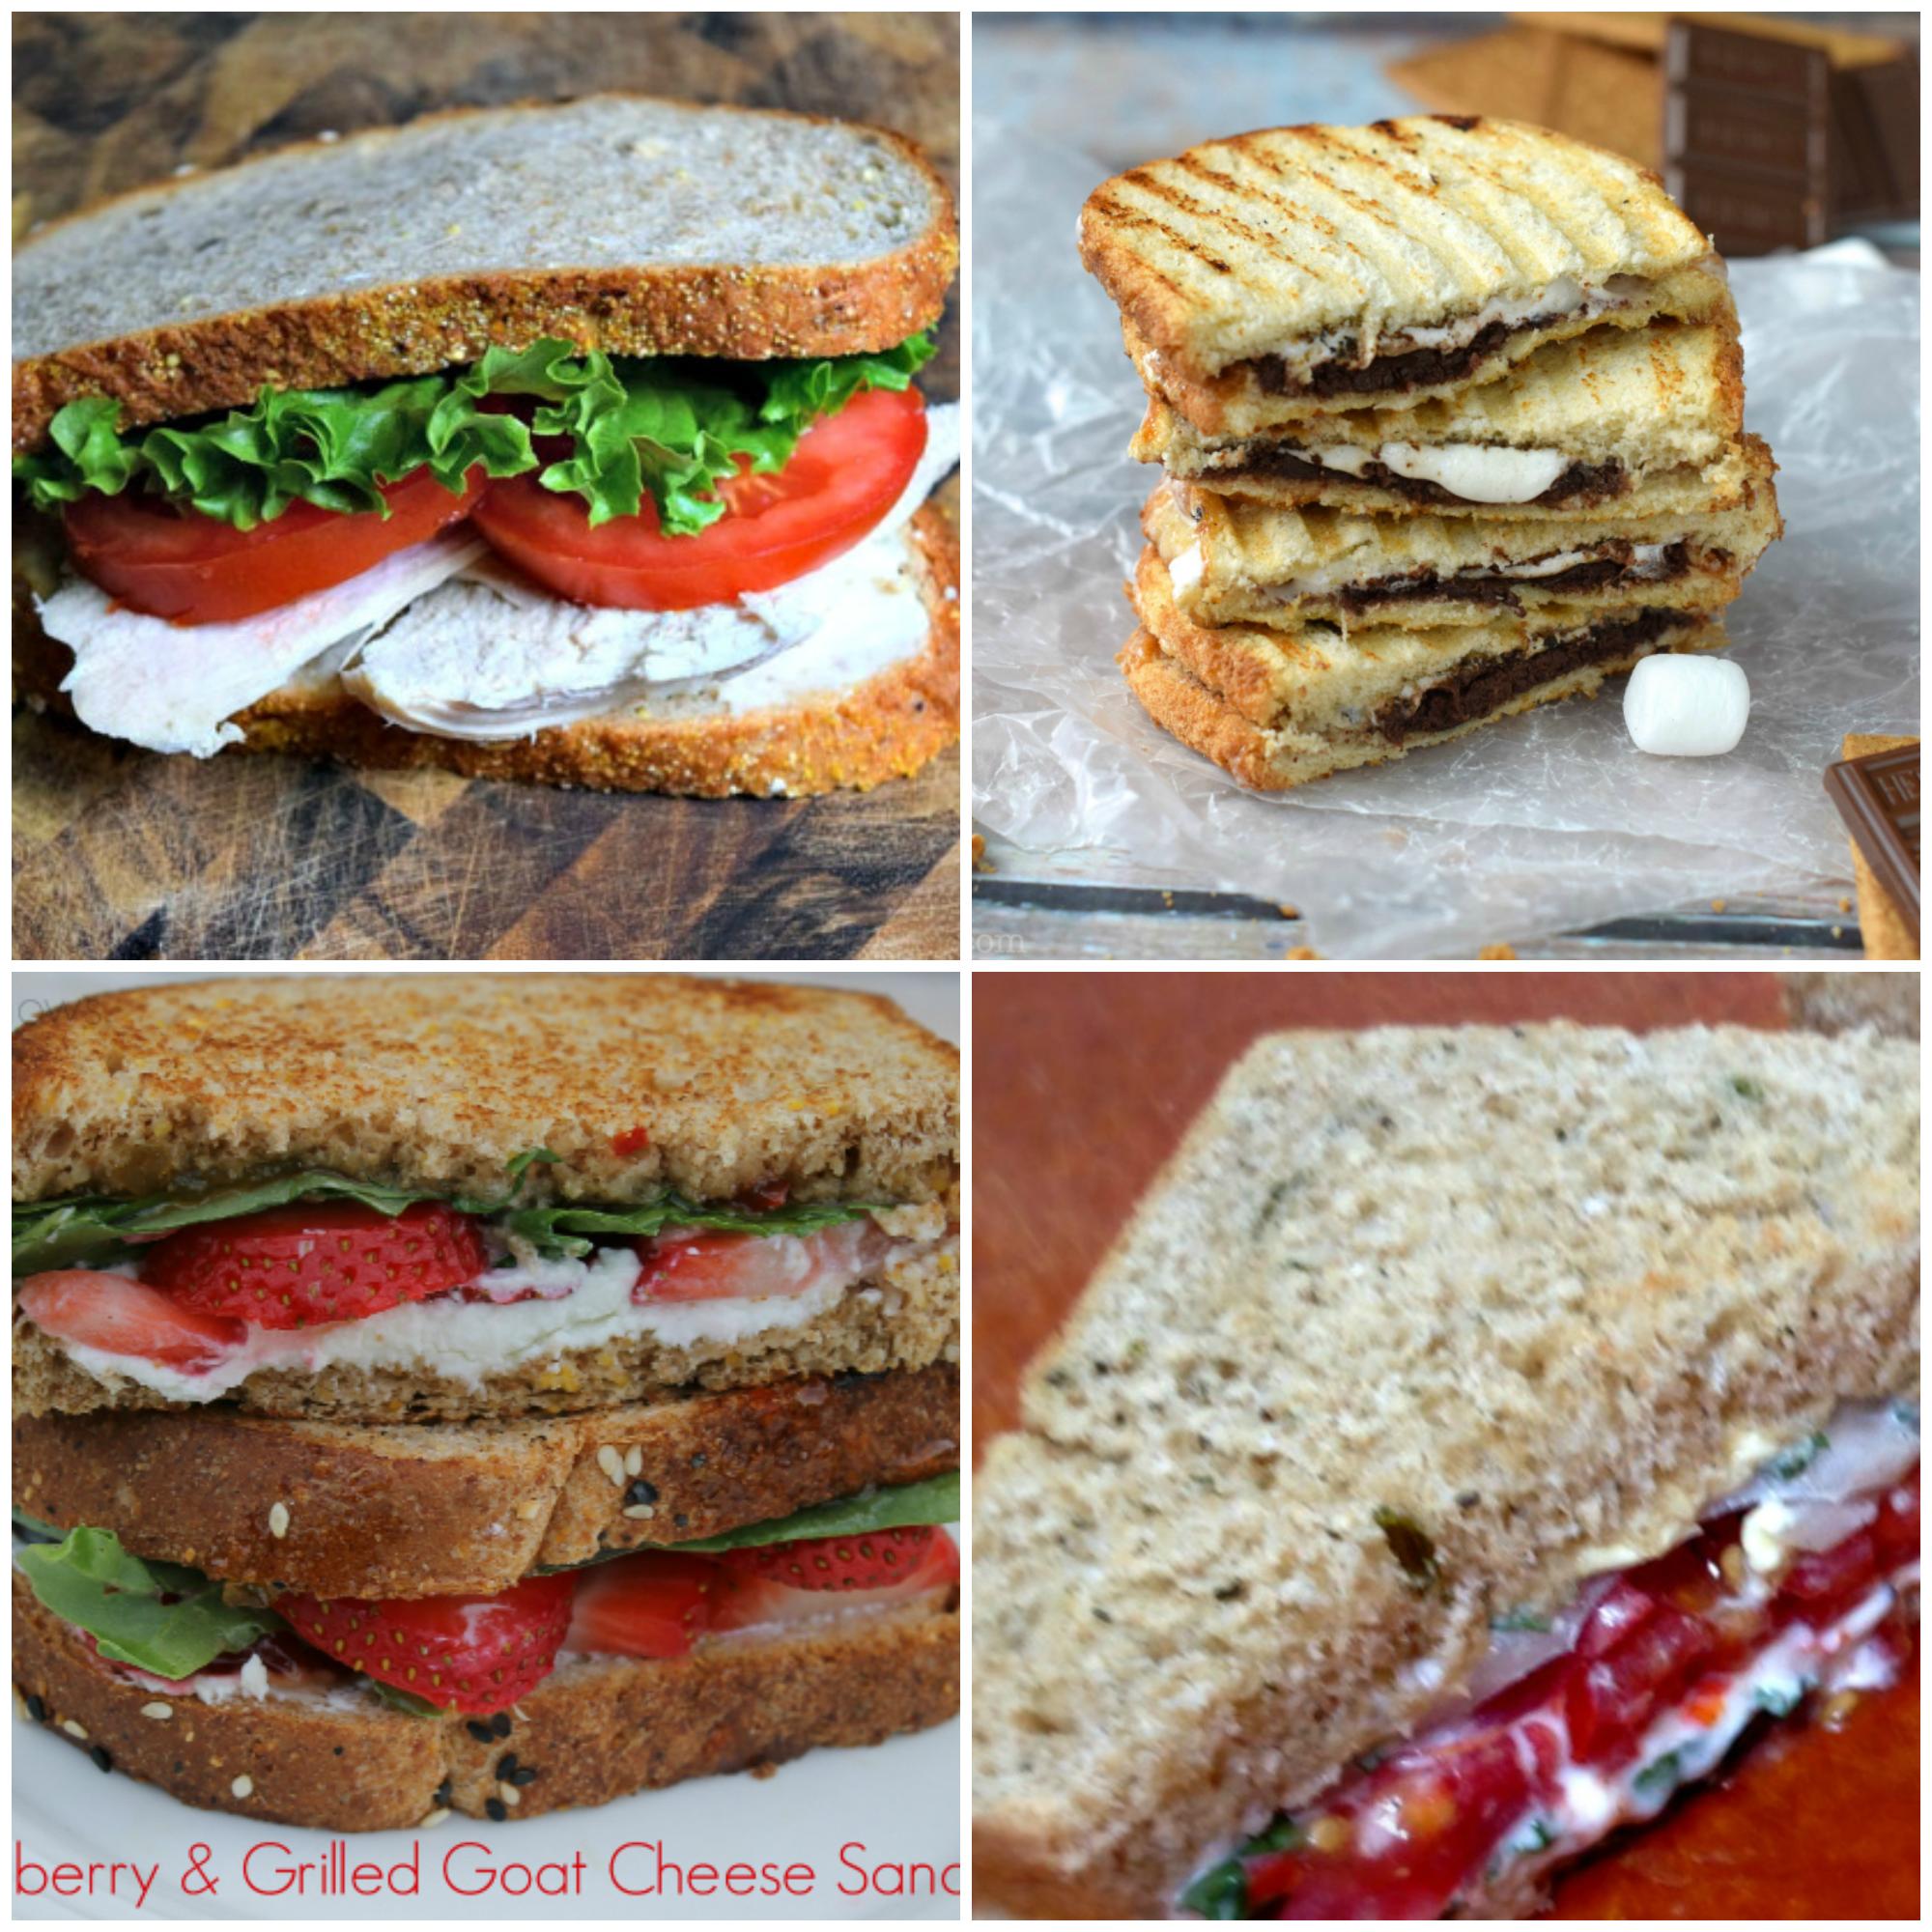 WCW Sandwich Features